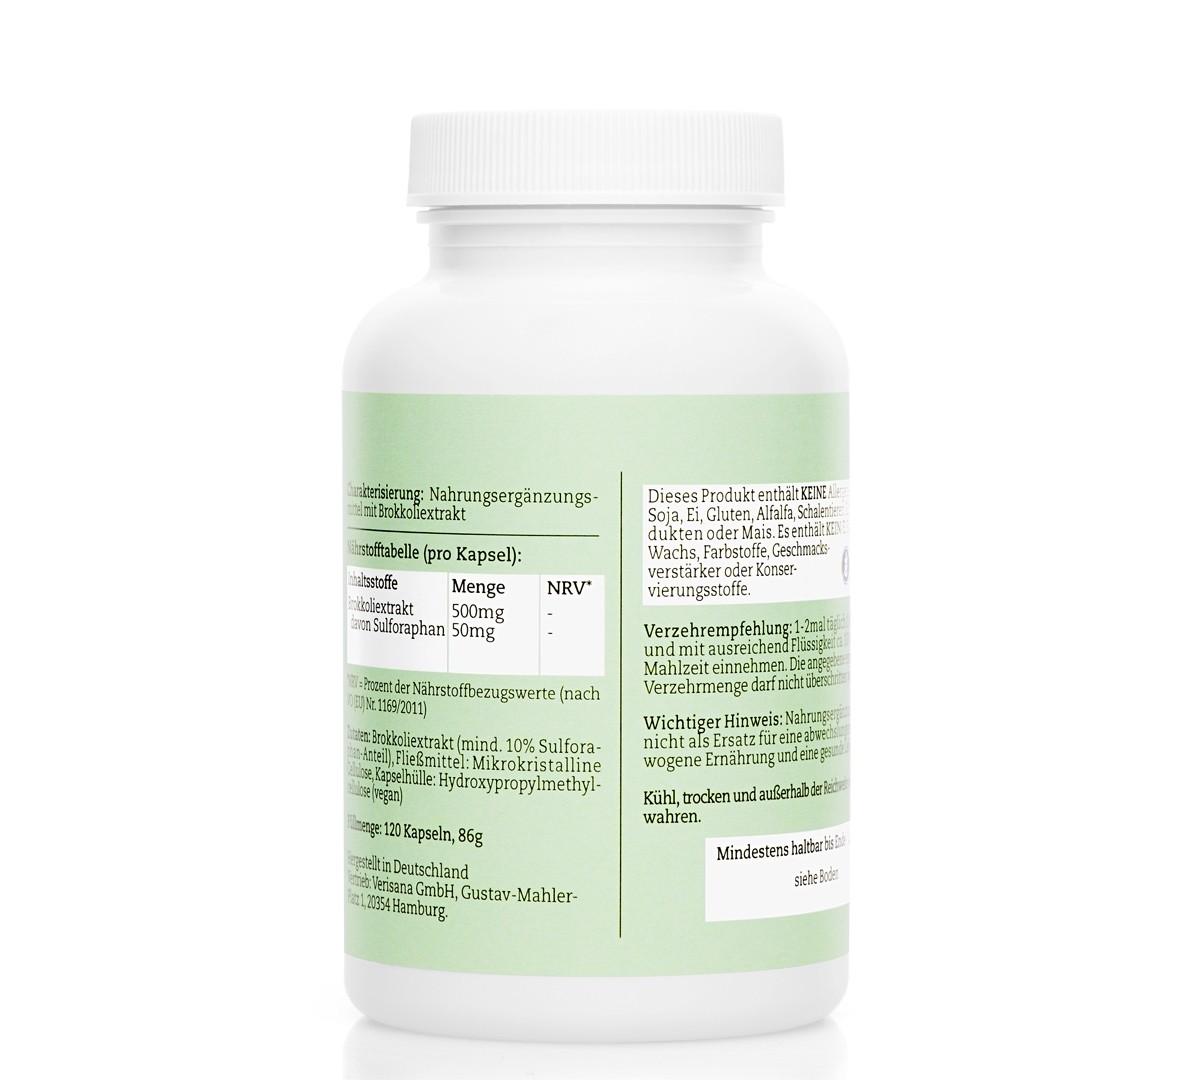 Brokkoliextrakt, Nahrungsergänzungsmittel mit Sulforaphan